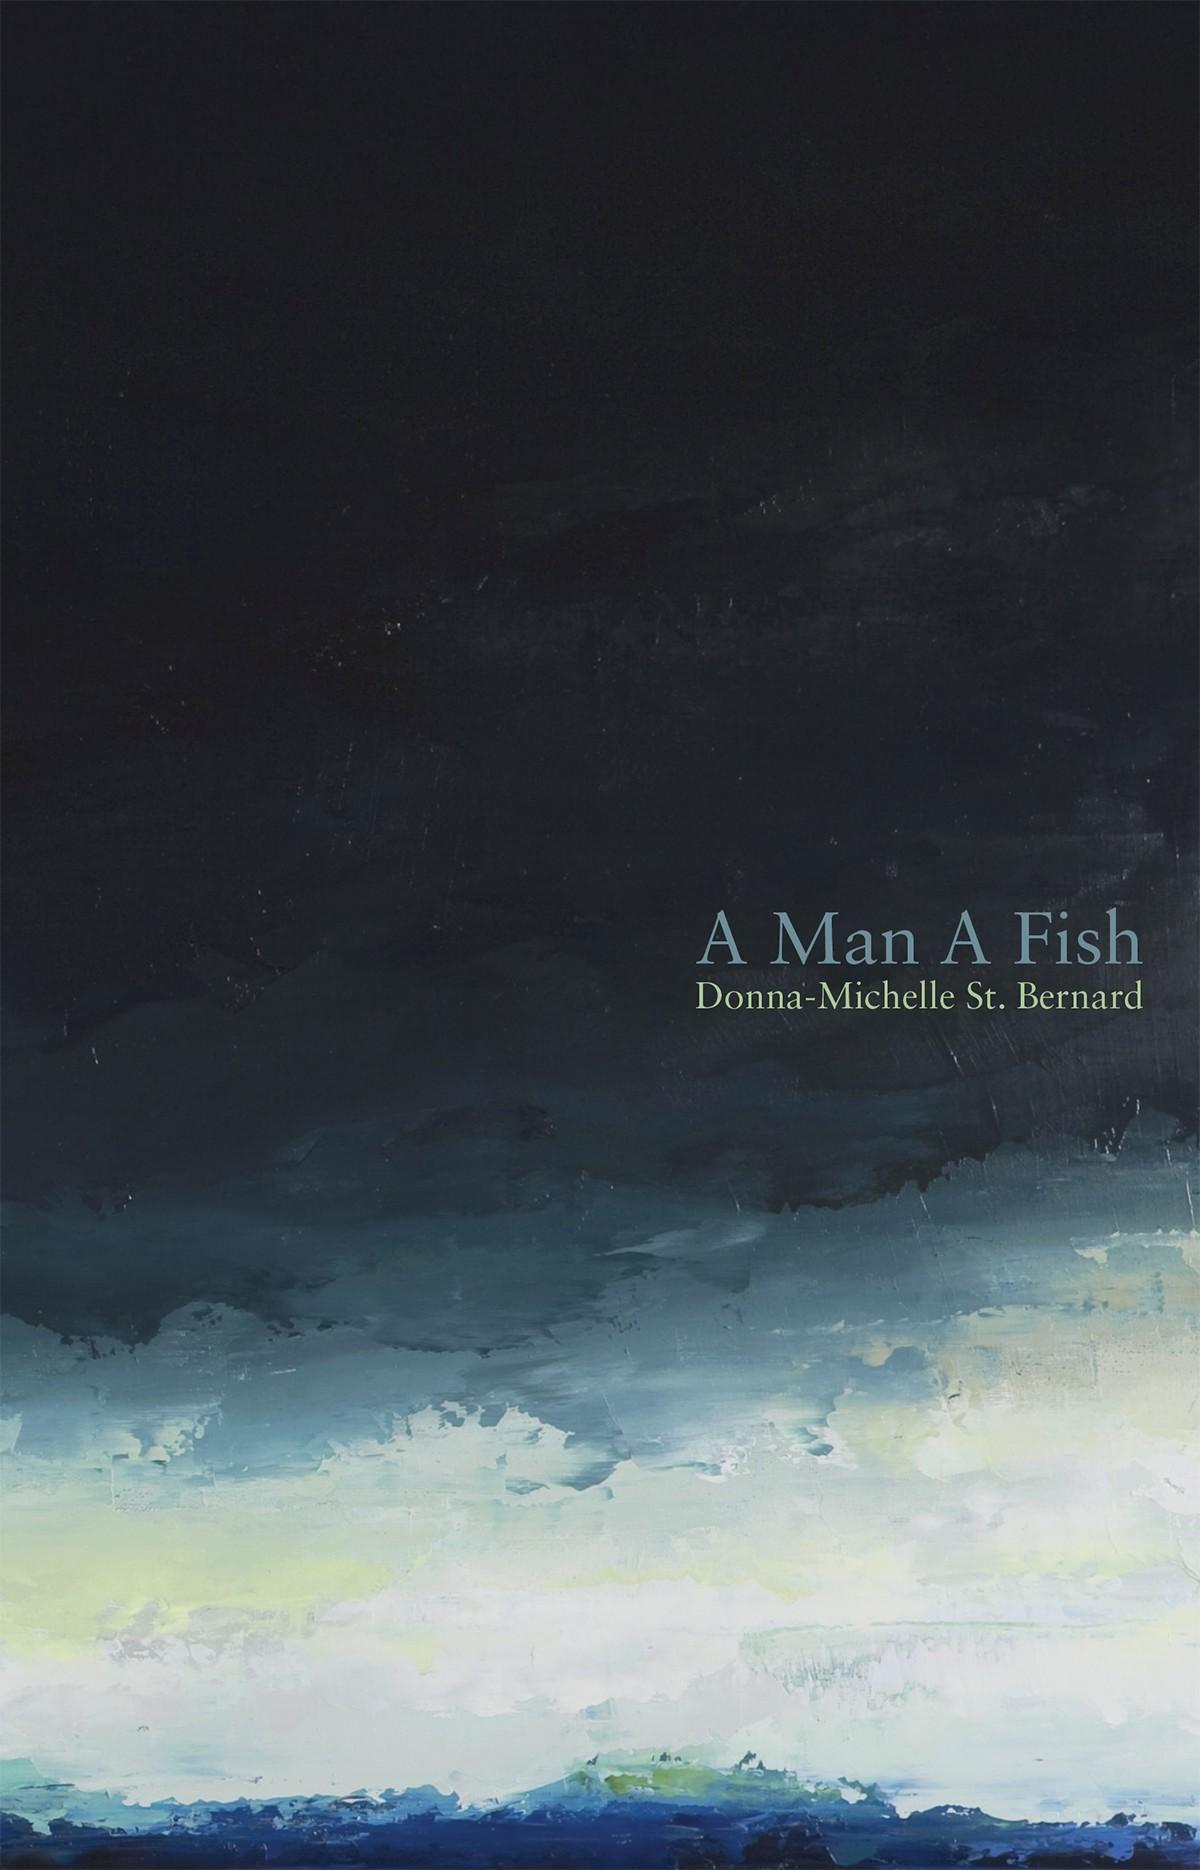 A Man A Fish (print)